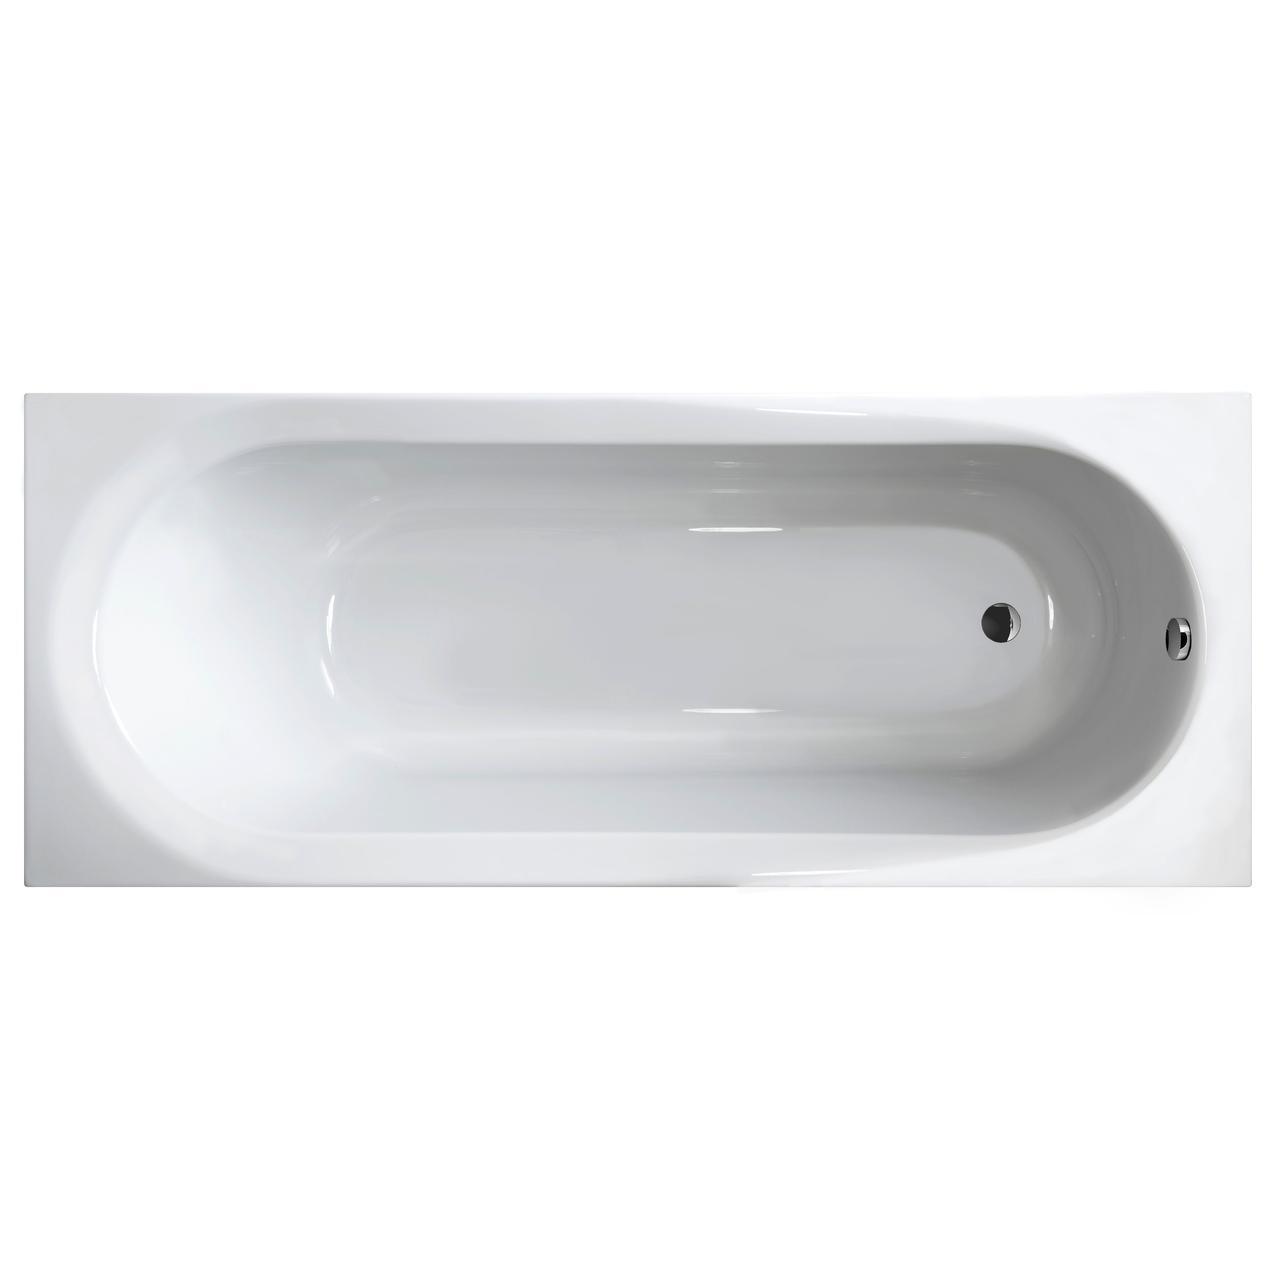 Ванна акриловая Volle AIVA 170х70х44 без ножек